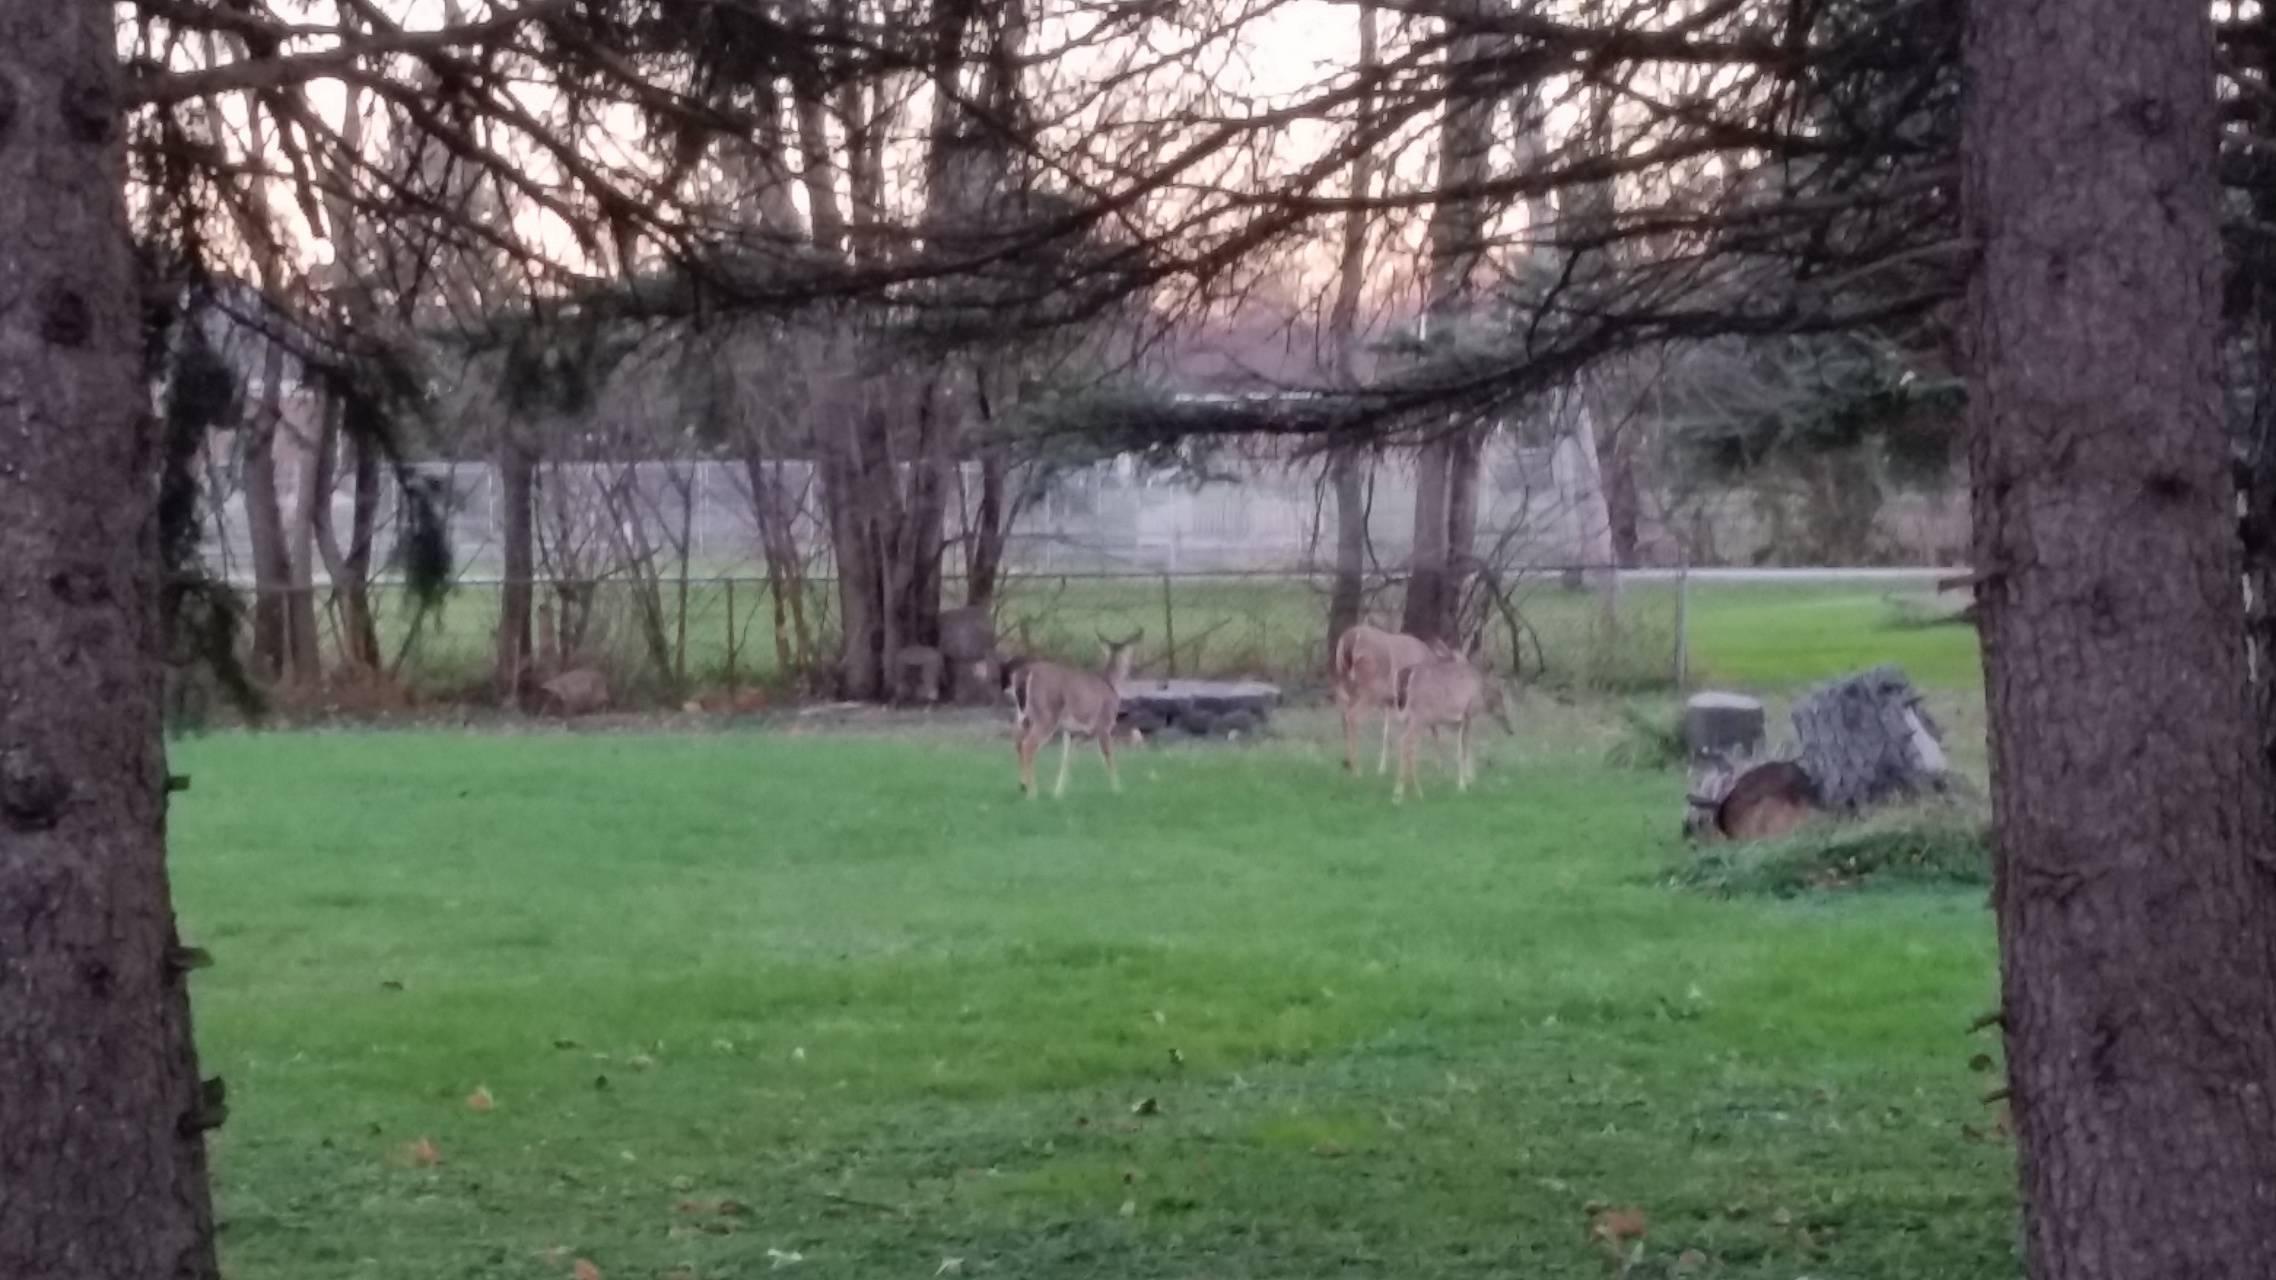 Evening visitors